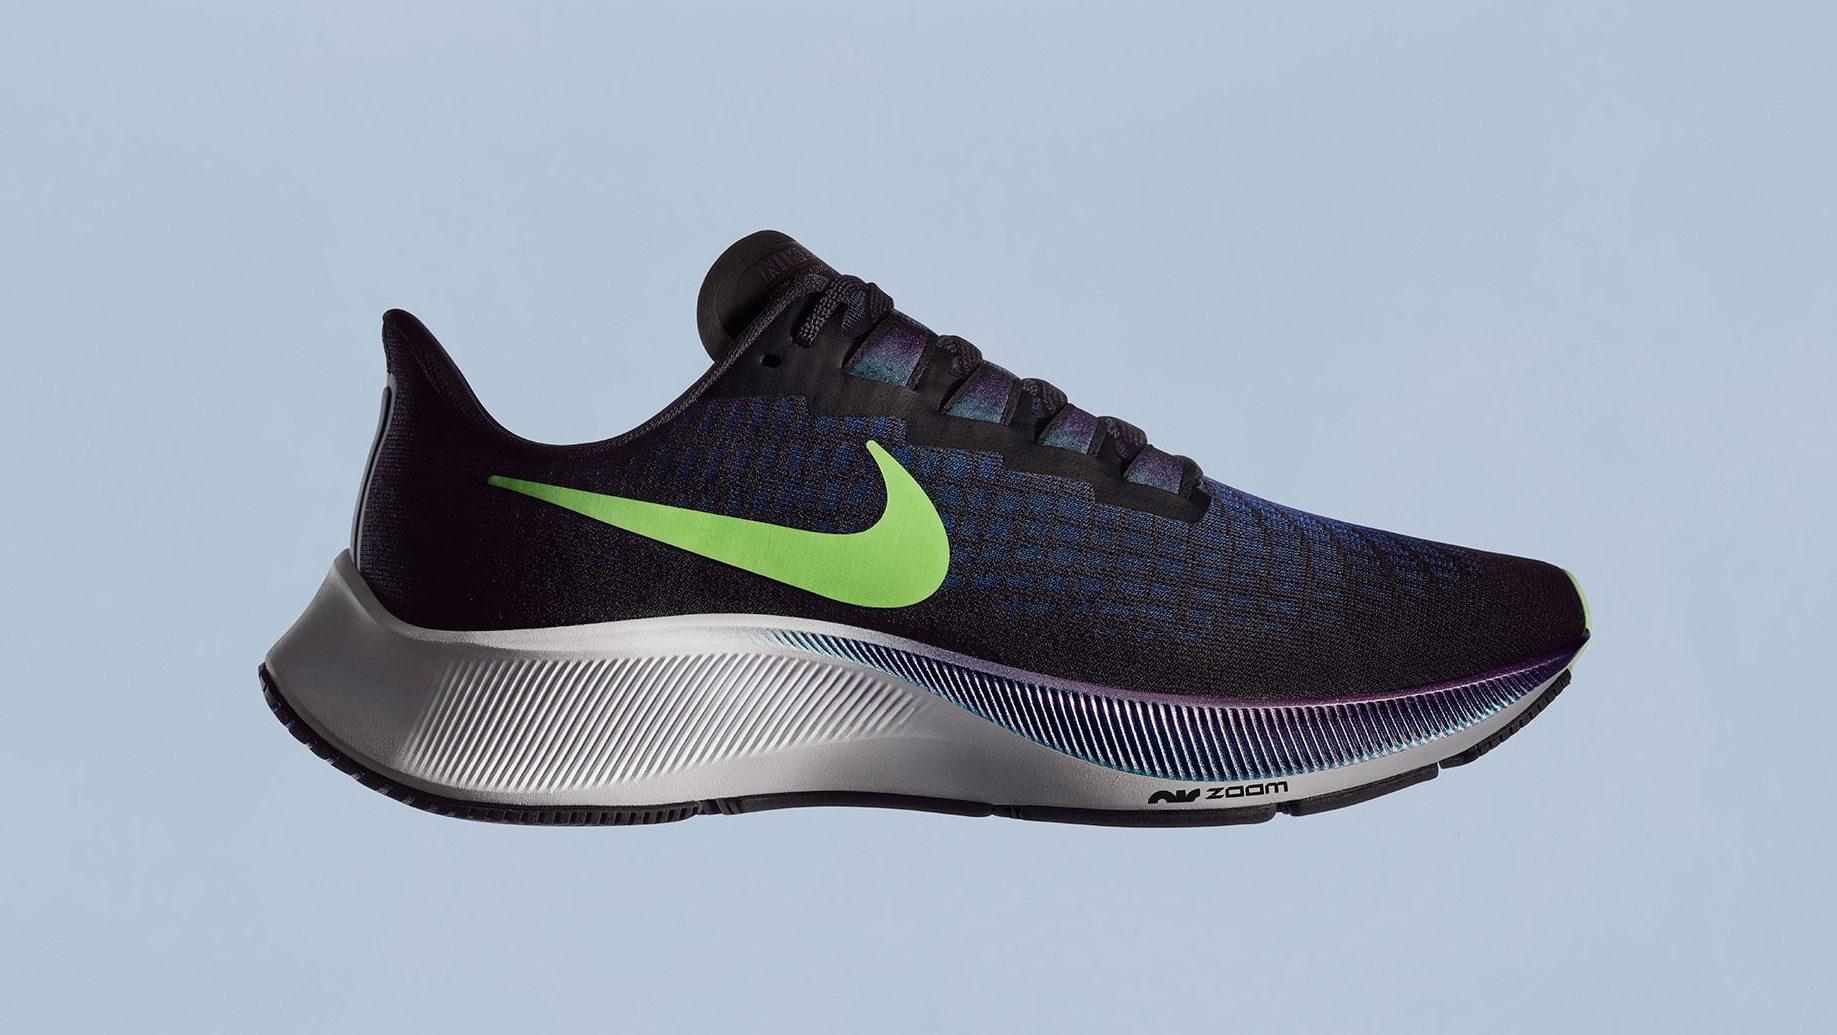 nike zoom original shoes price